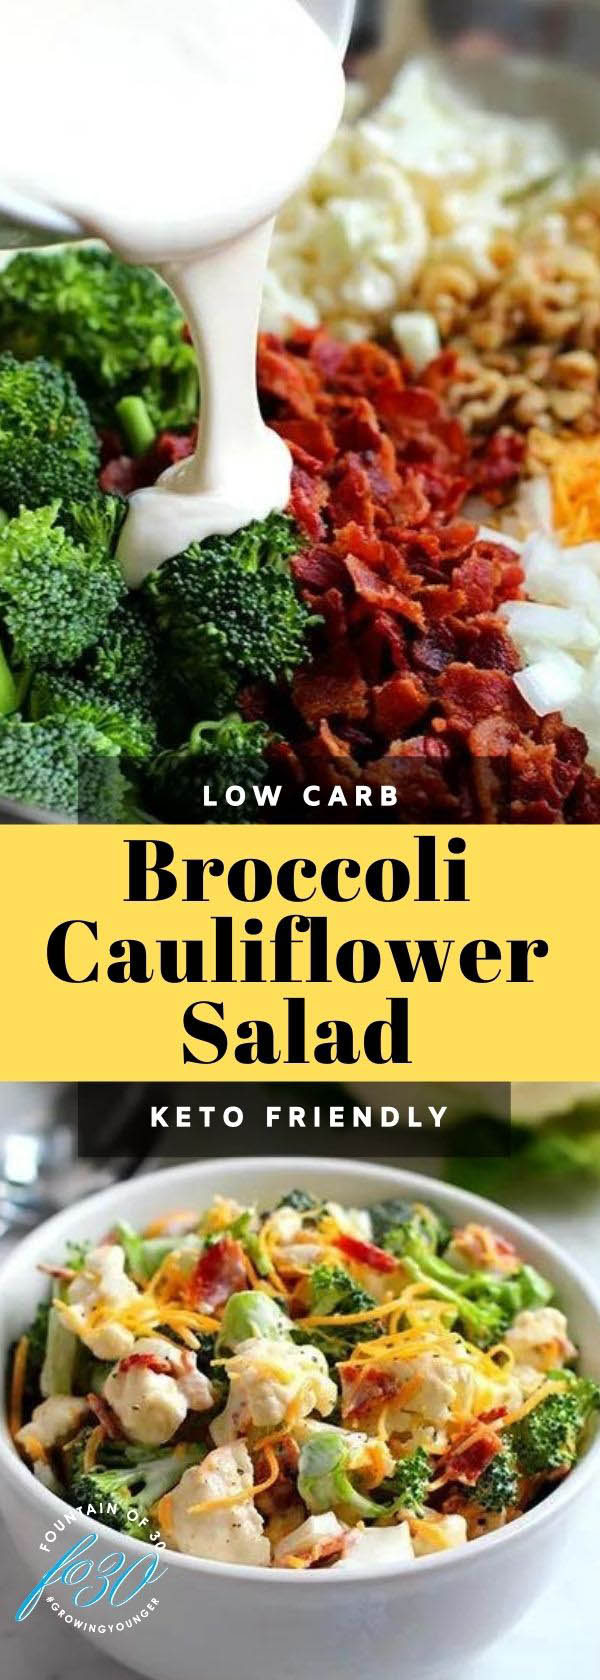 low-carb broccoli cauliflower salad fountainof30